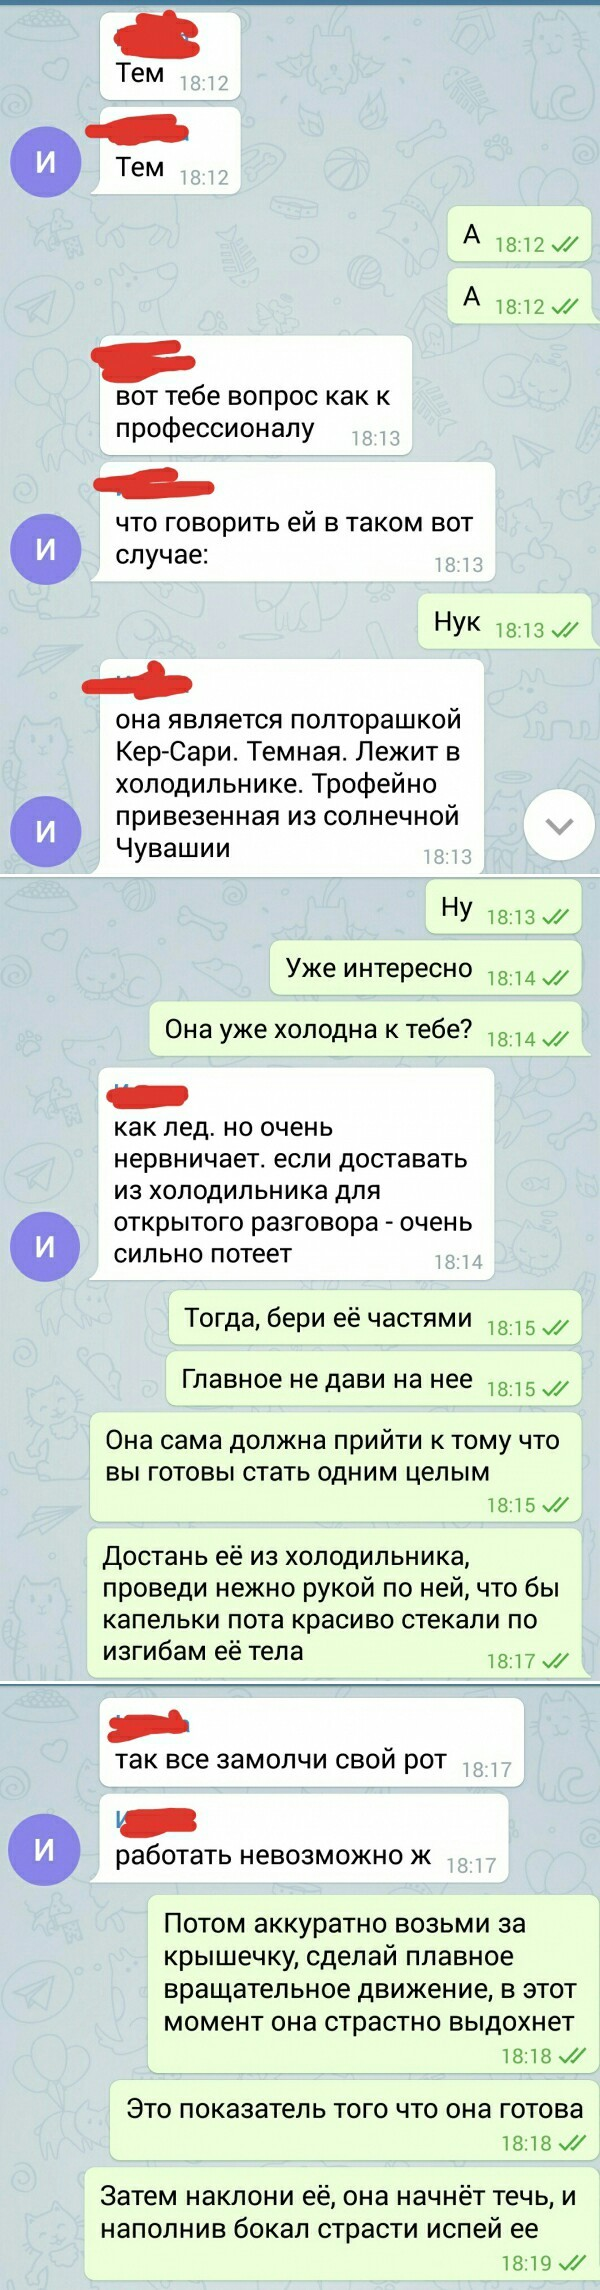 Меф Сайт Омск Трамал Сайт Серов